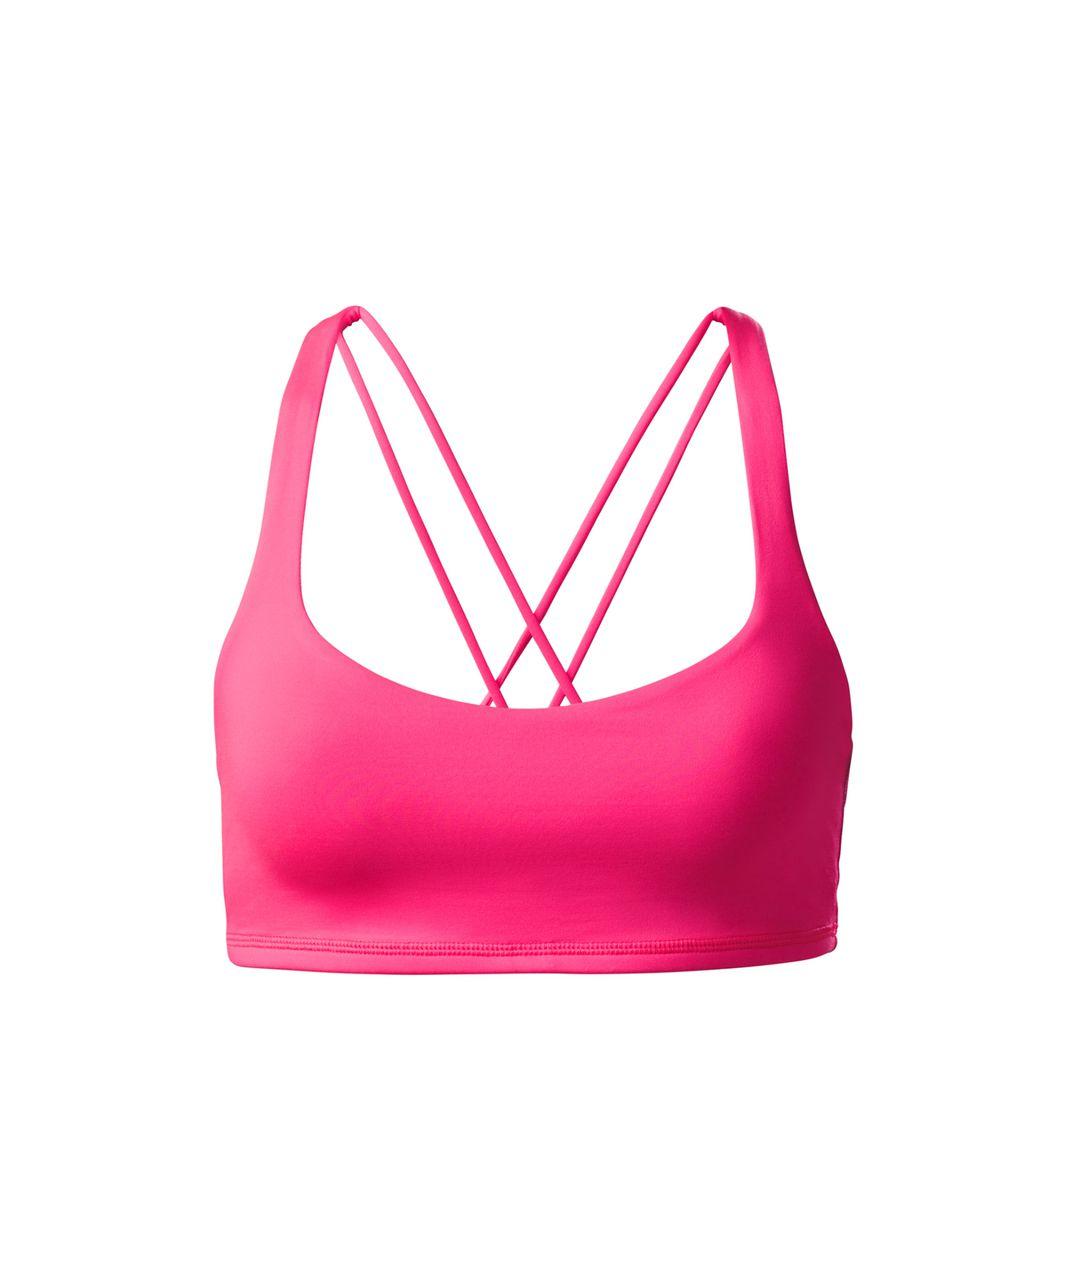 Lululemon Free To Be Bra - Neon Pink